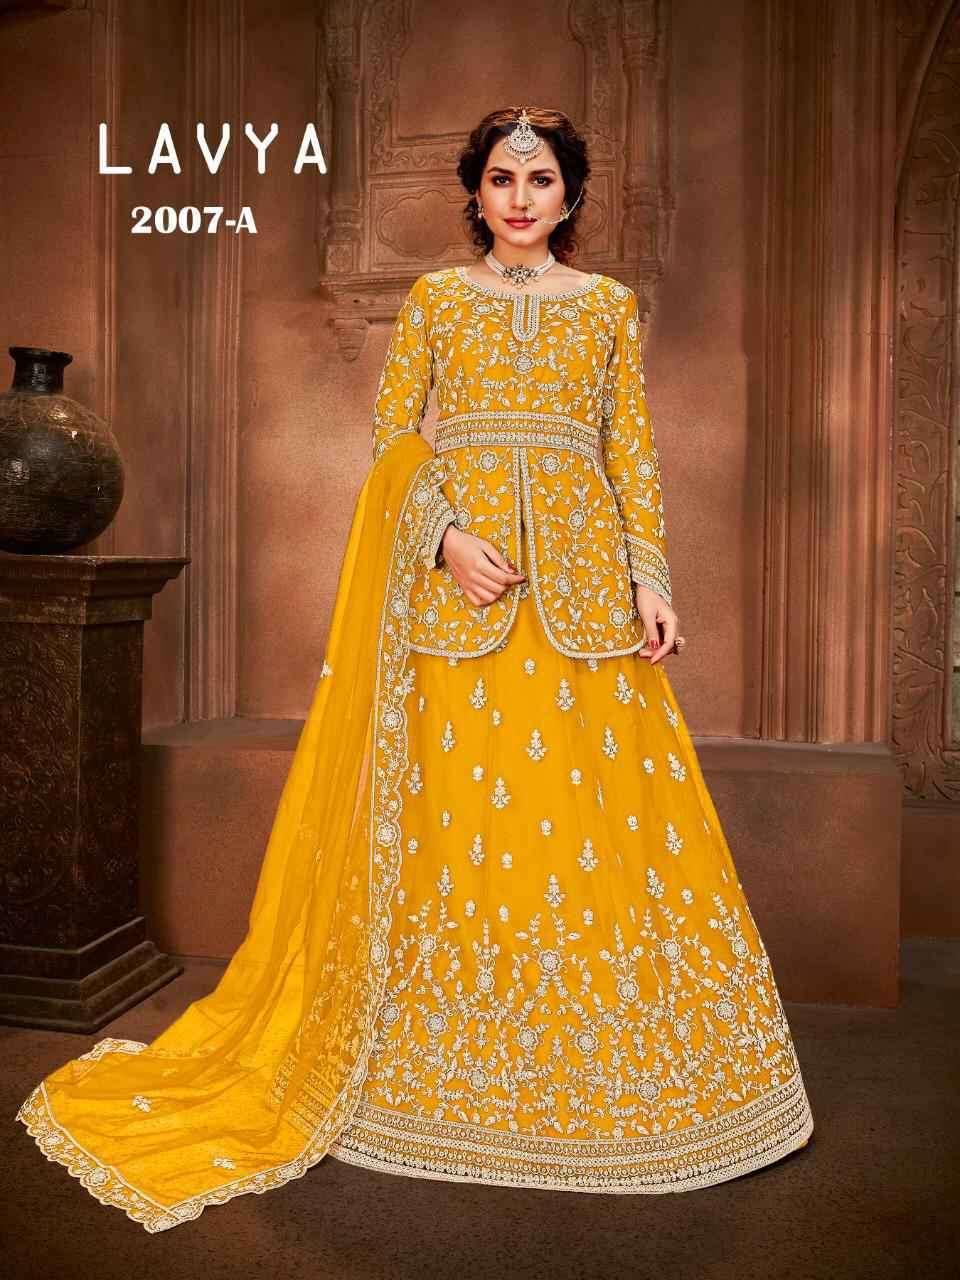 Avighaya Lavya Designer Exlcusive party Wear Dress Wholesaler